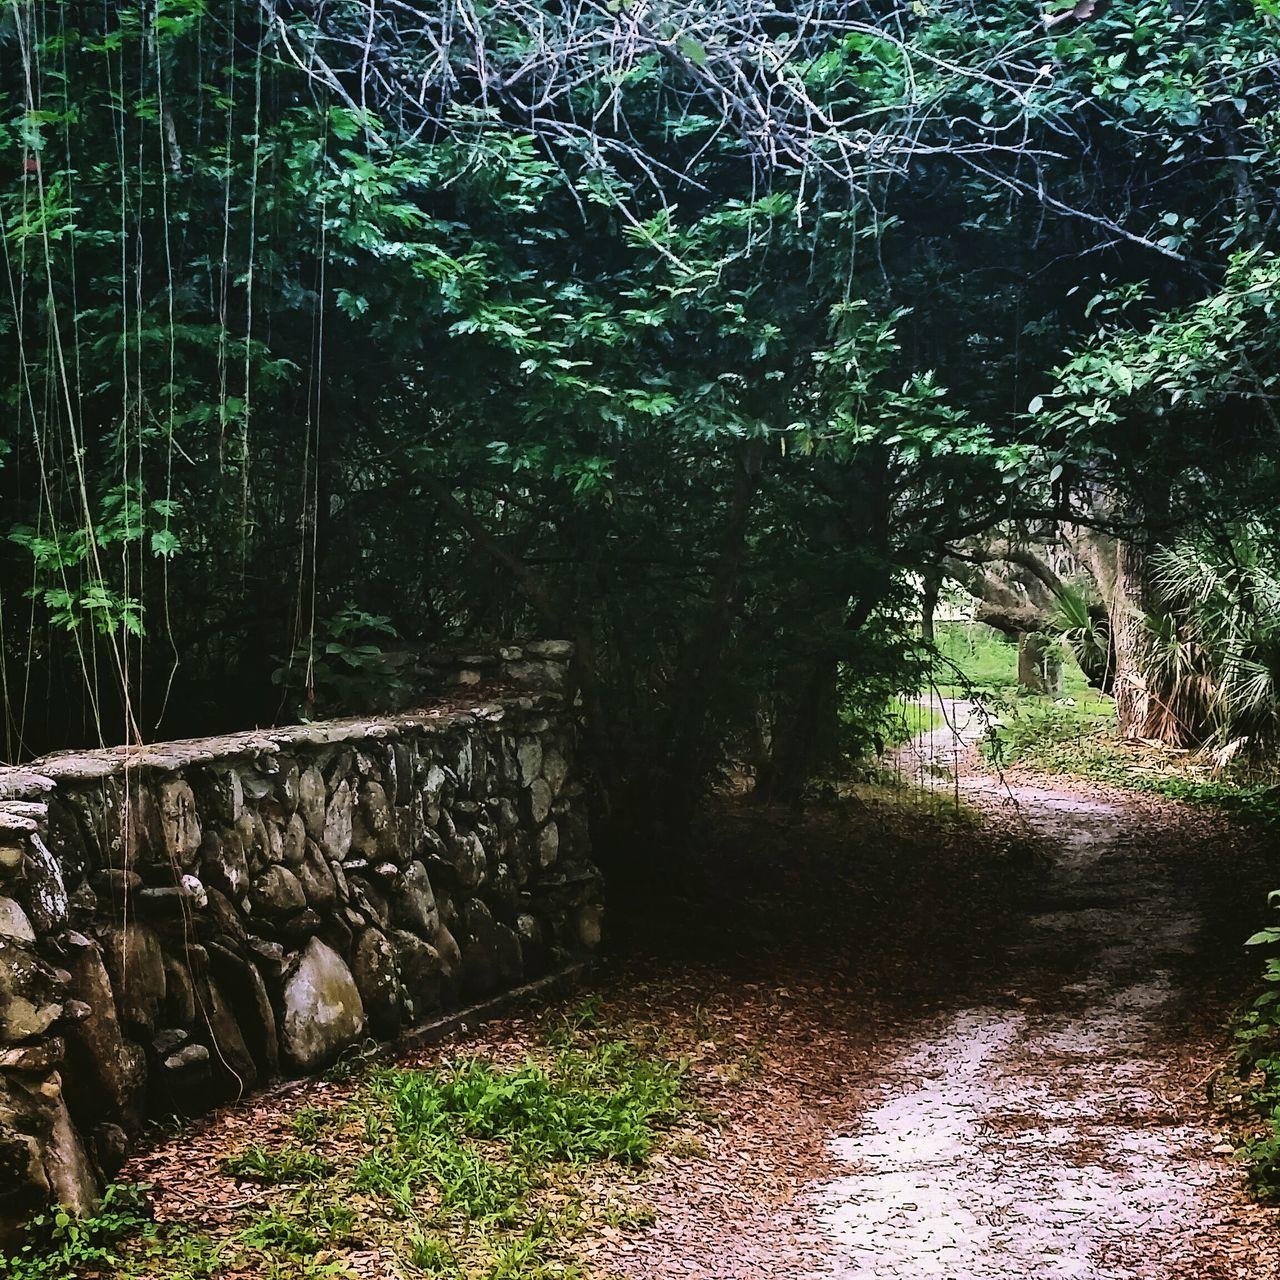 Secret Garden Stonework Secret Passage South Florida CanopyWalkway Green Leaves Florida Florida History Nature Nature Path